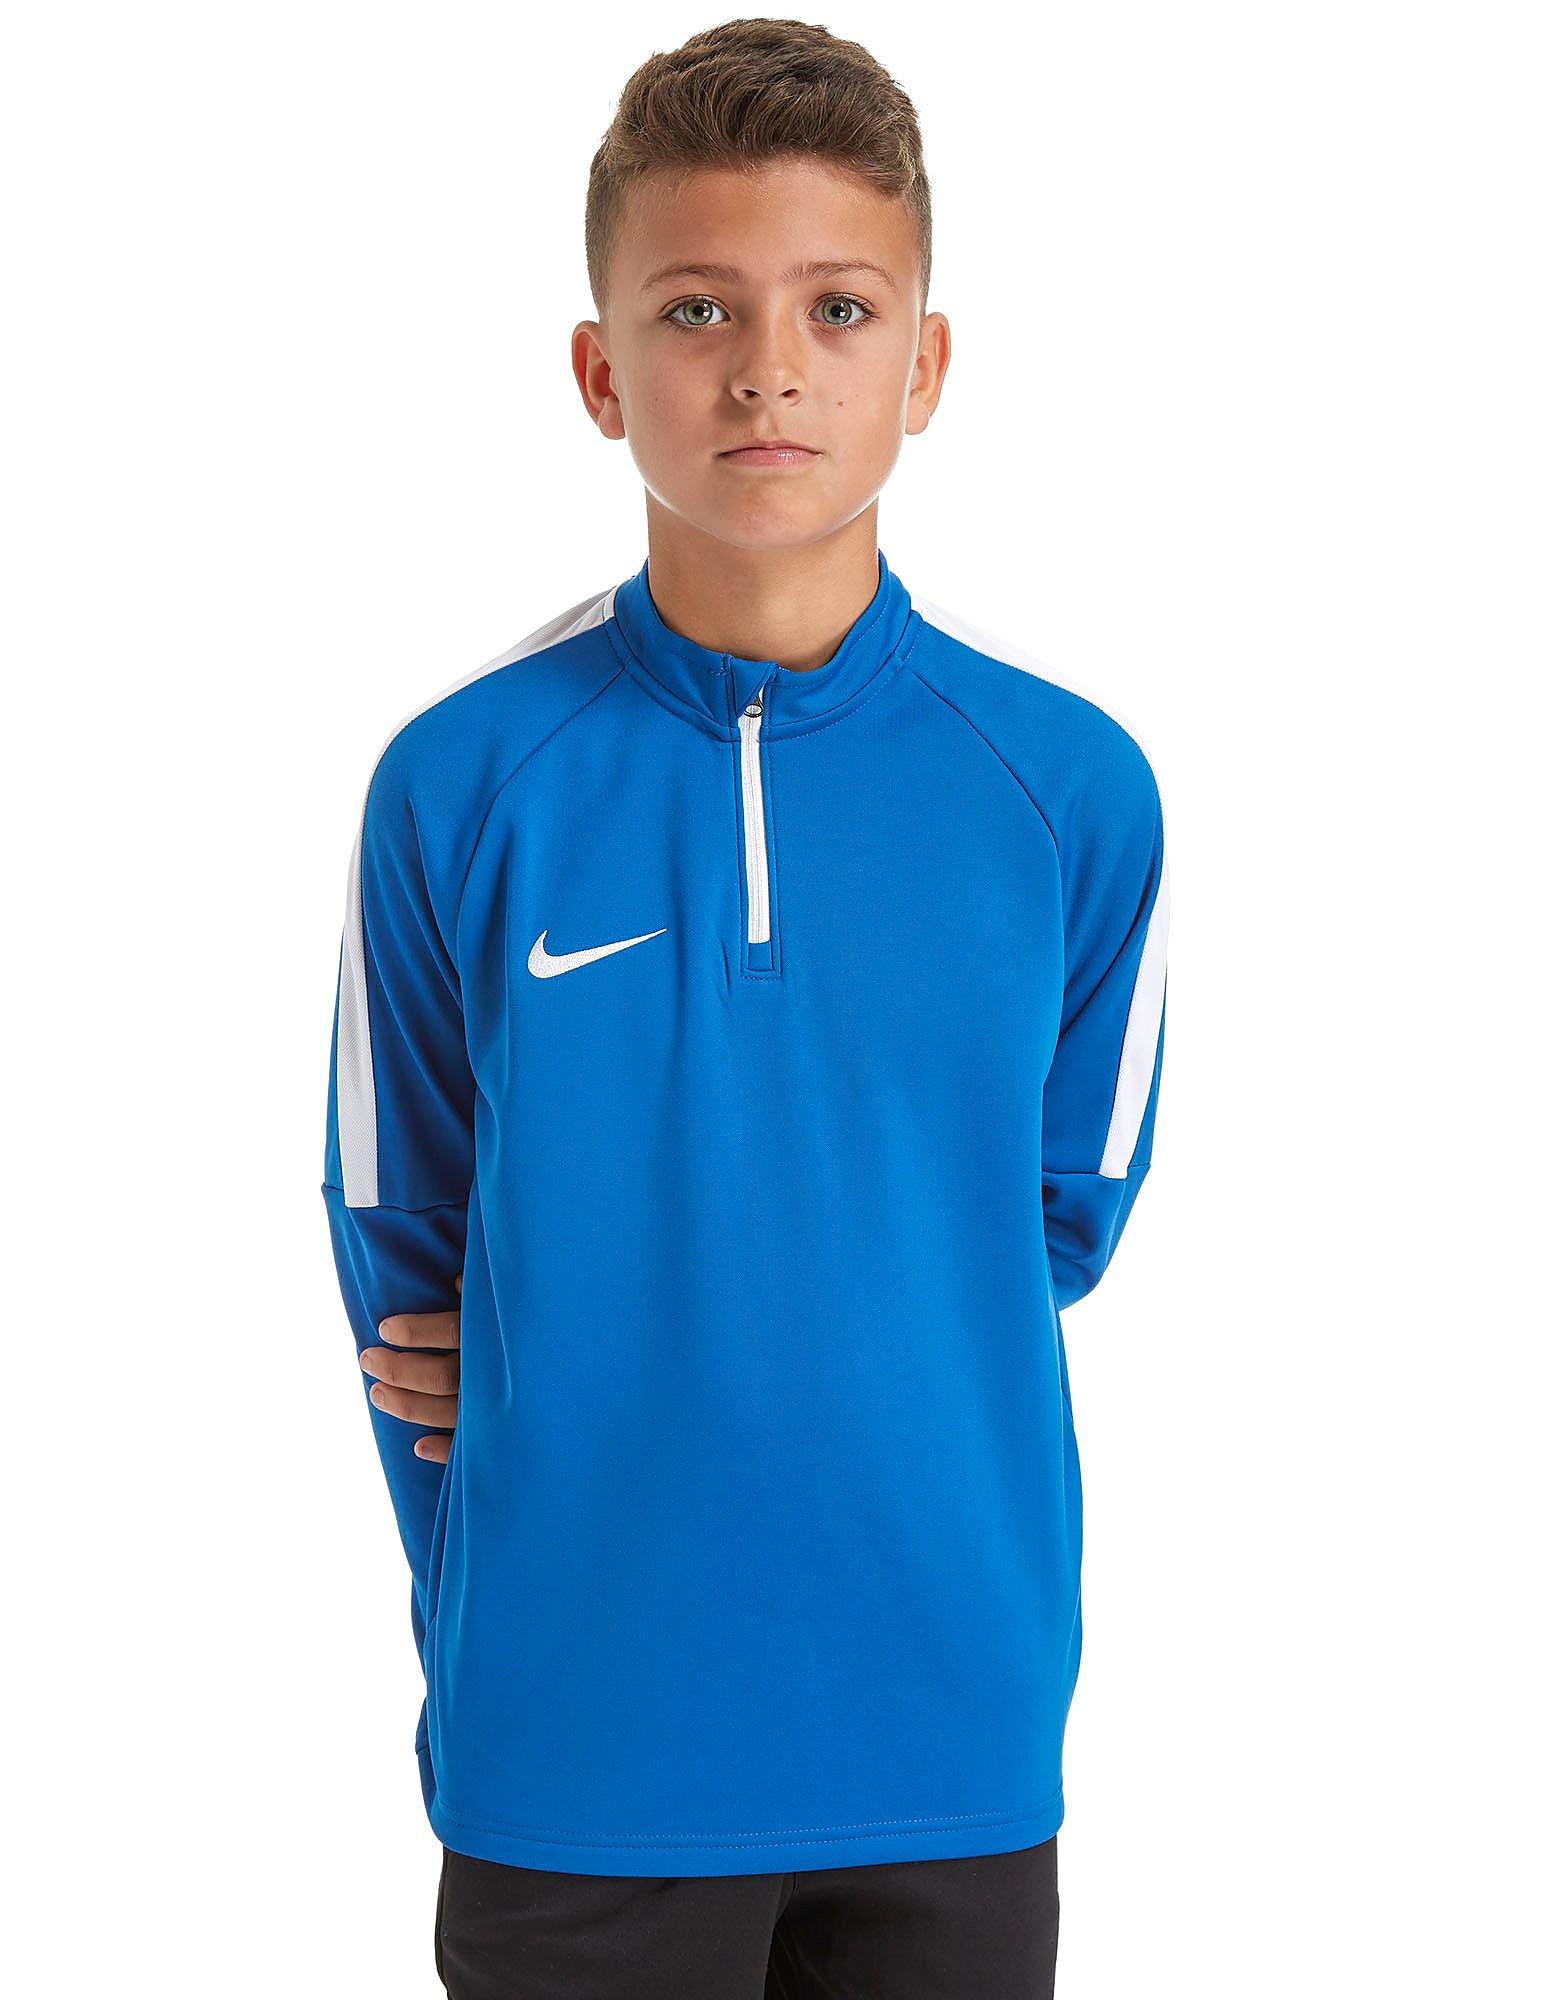 Nike Jaquette Academy Junior - Blue/White, Blue/White